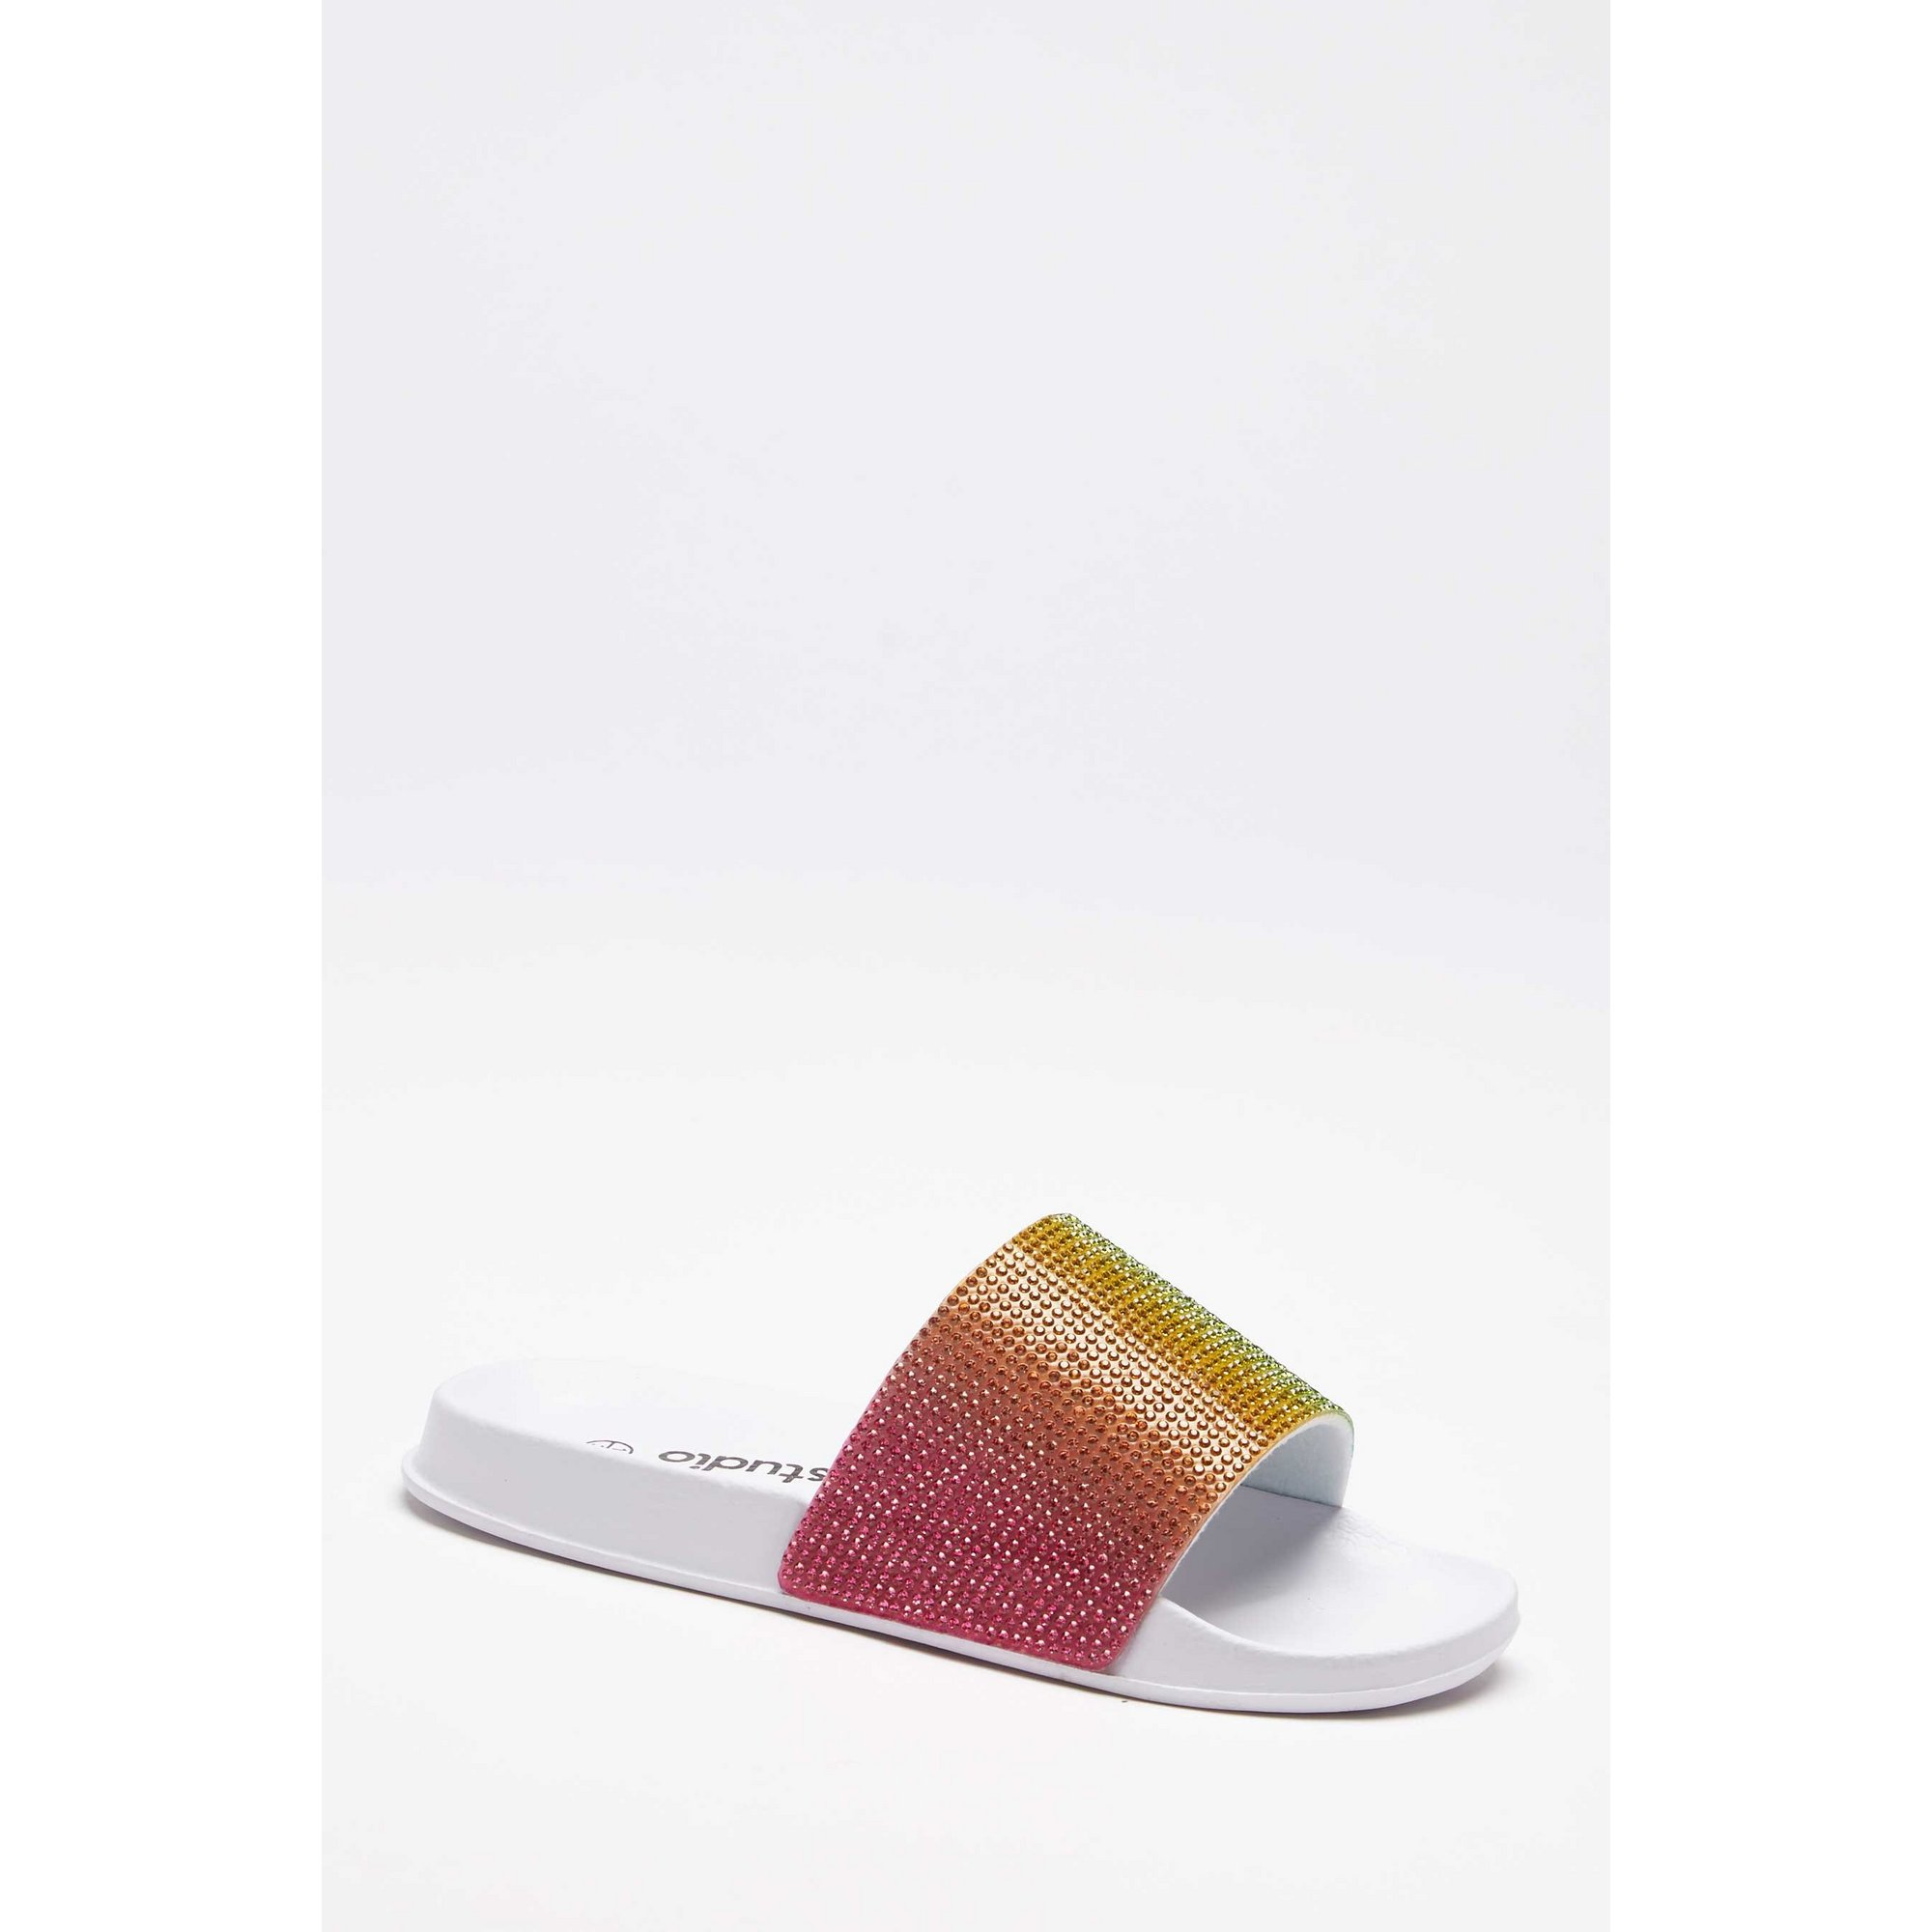 Image of Girls Diamante Rainbow Sliders